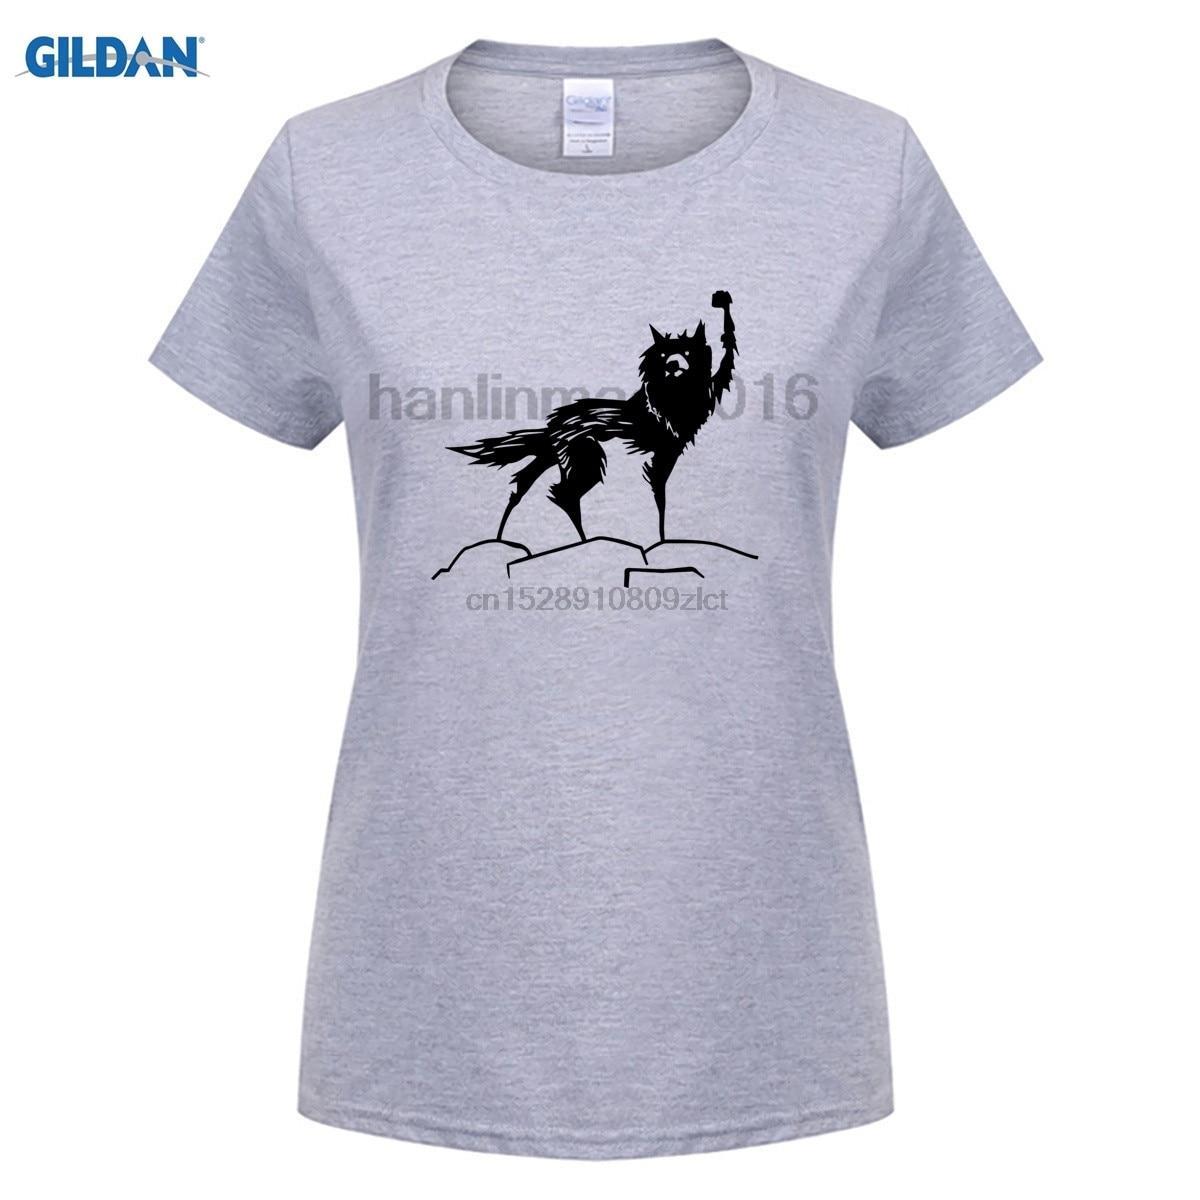 100% cotton O-neck printed T-shirt Fantastic Mr Fox T-Shirt for men